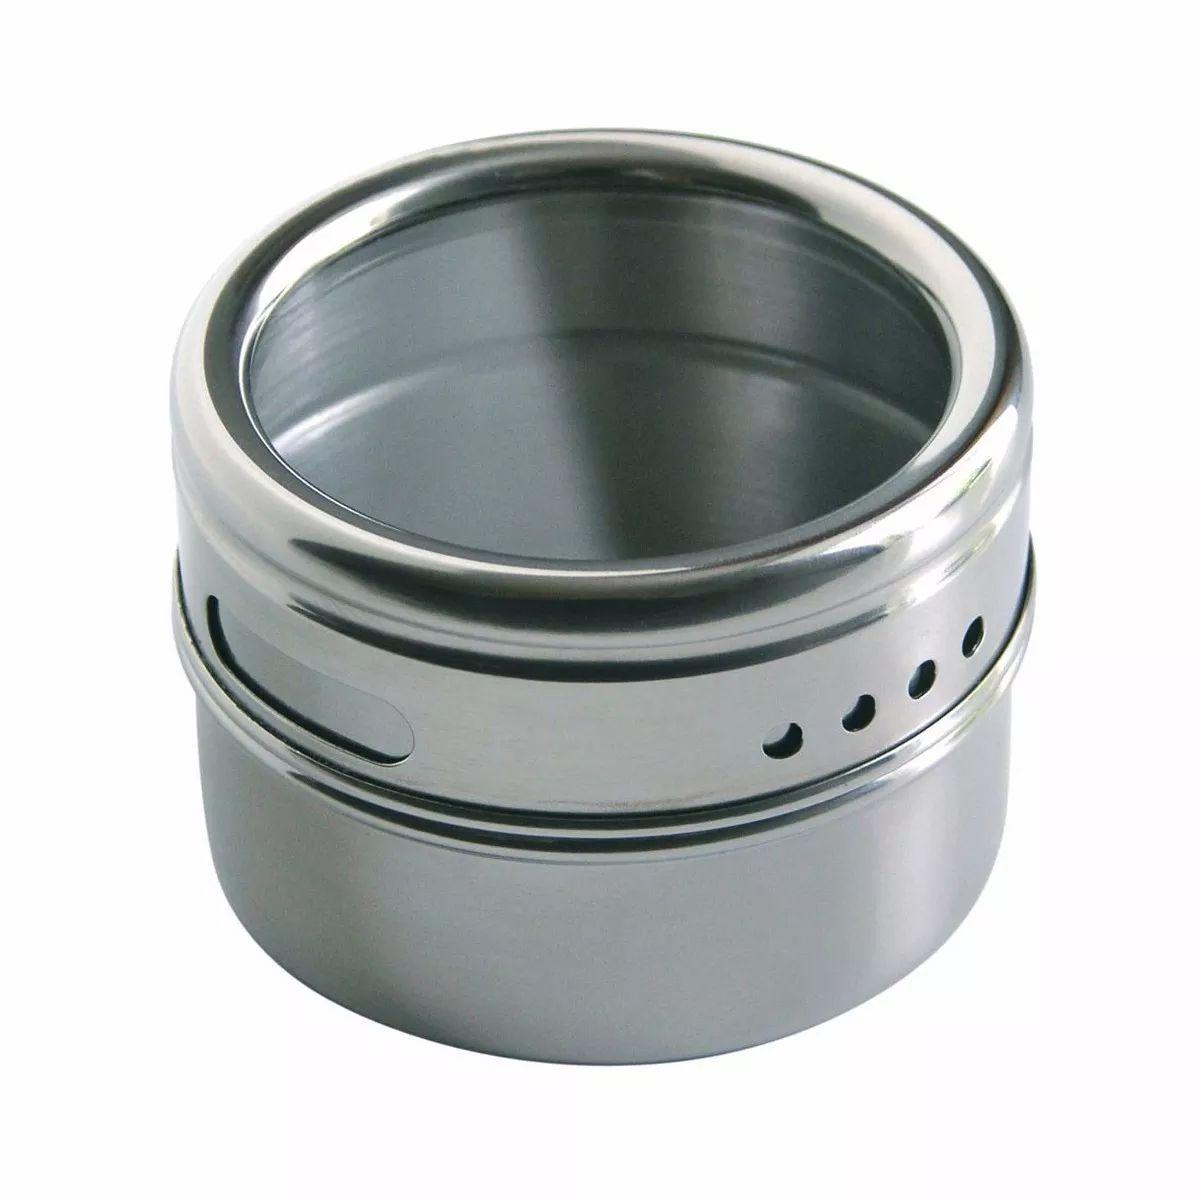 Porta Temperos E Condimentos Magnético Inox 3 Potes Cozinha